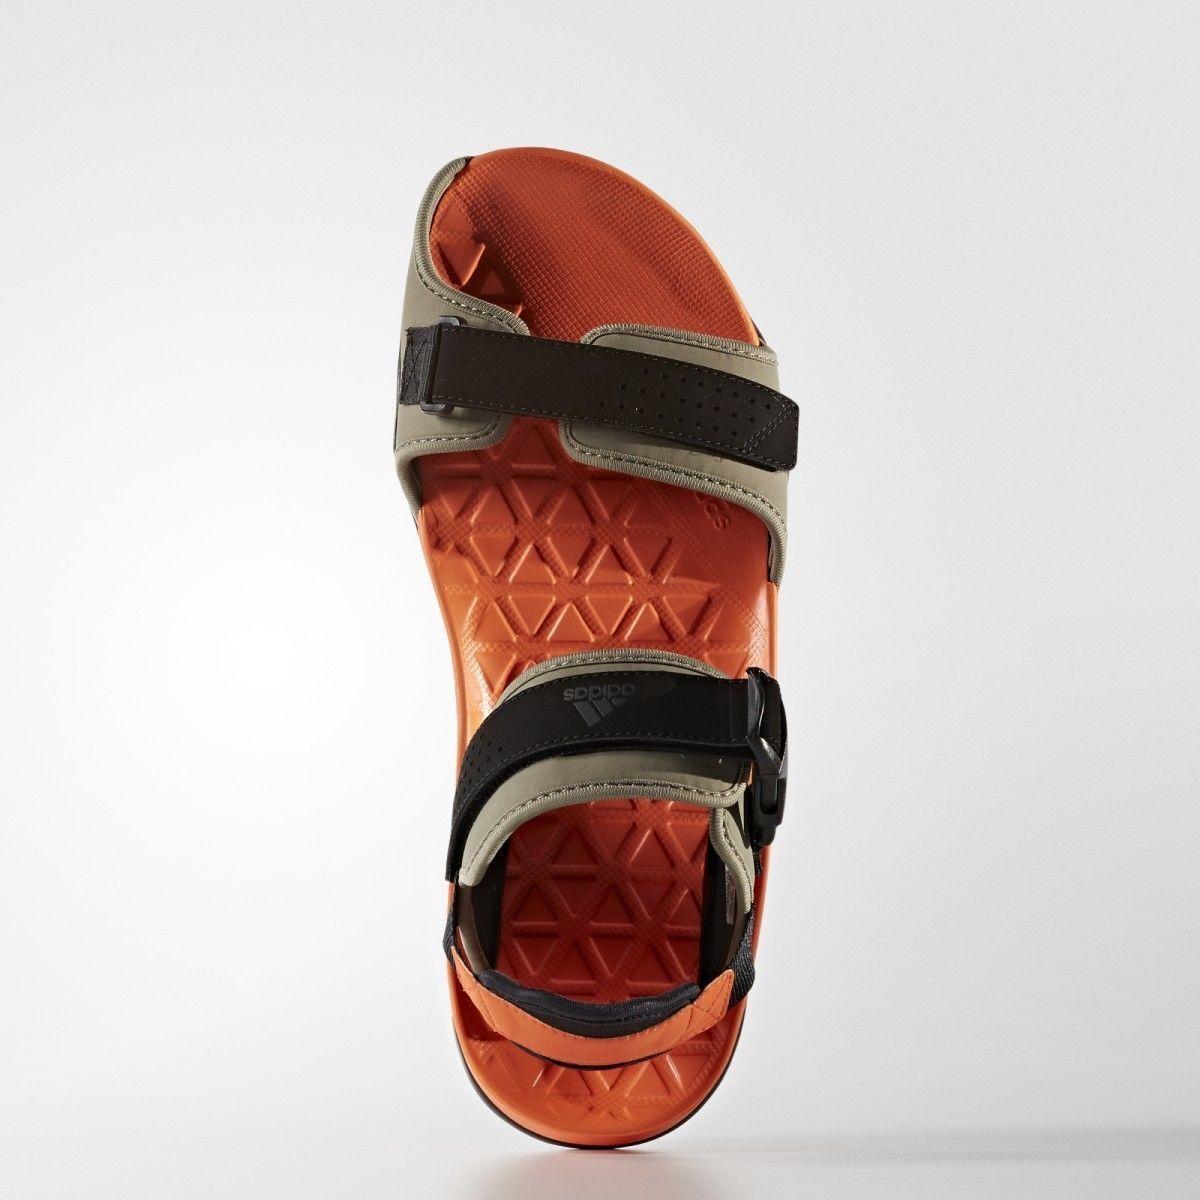 Adidas cyprex ultra sandalo ii (bb5448) sandali sportivi scarpe | Le vendite online  | Sig/Sig Ra Scarpa